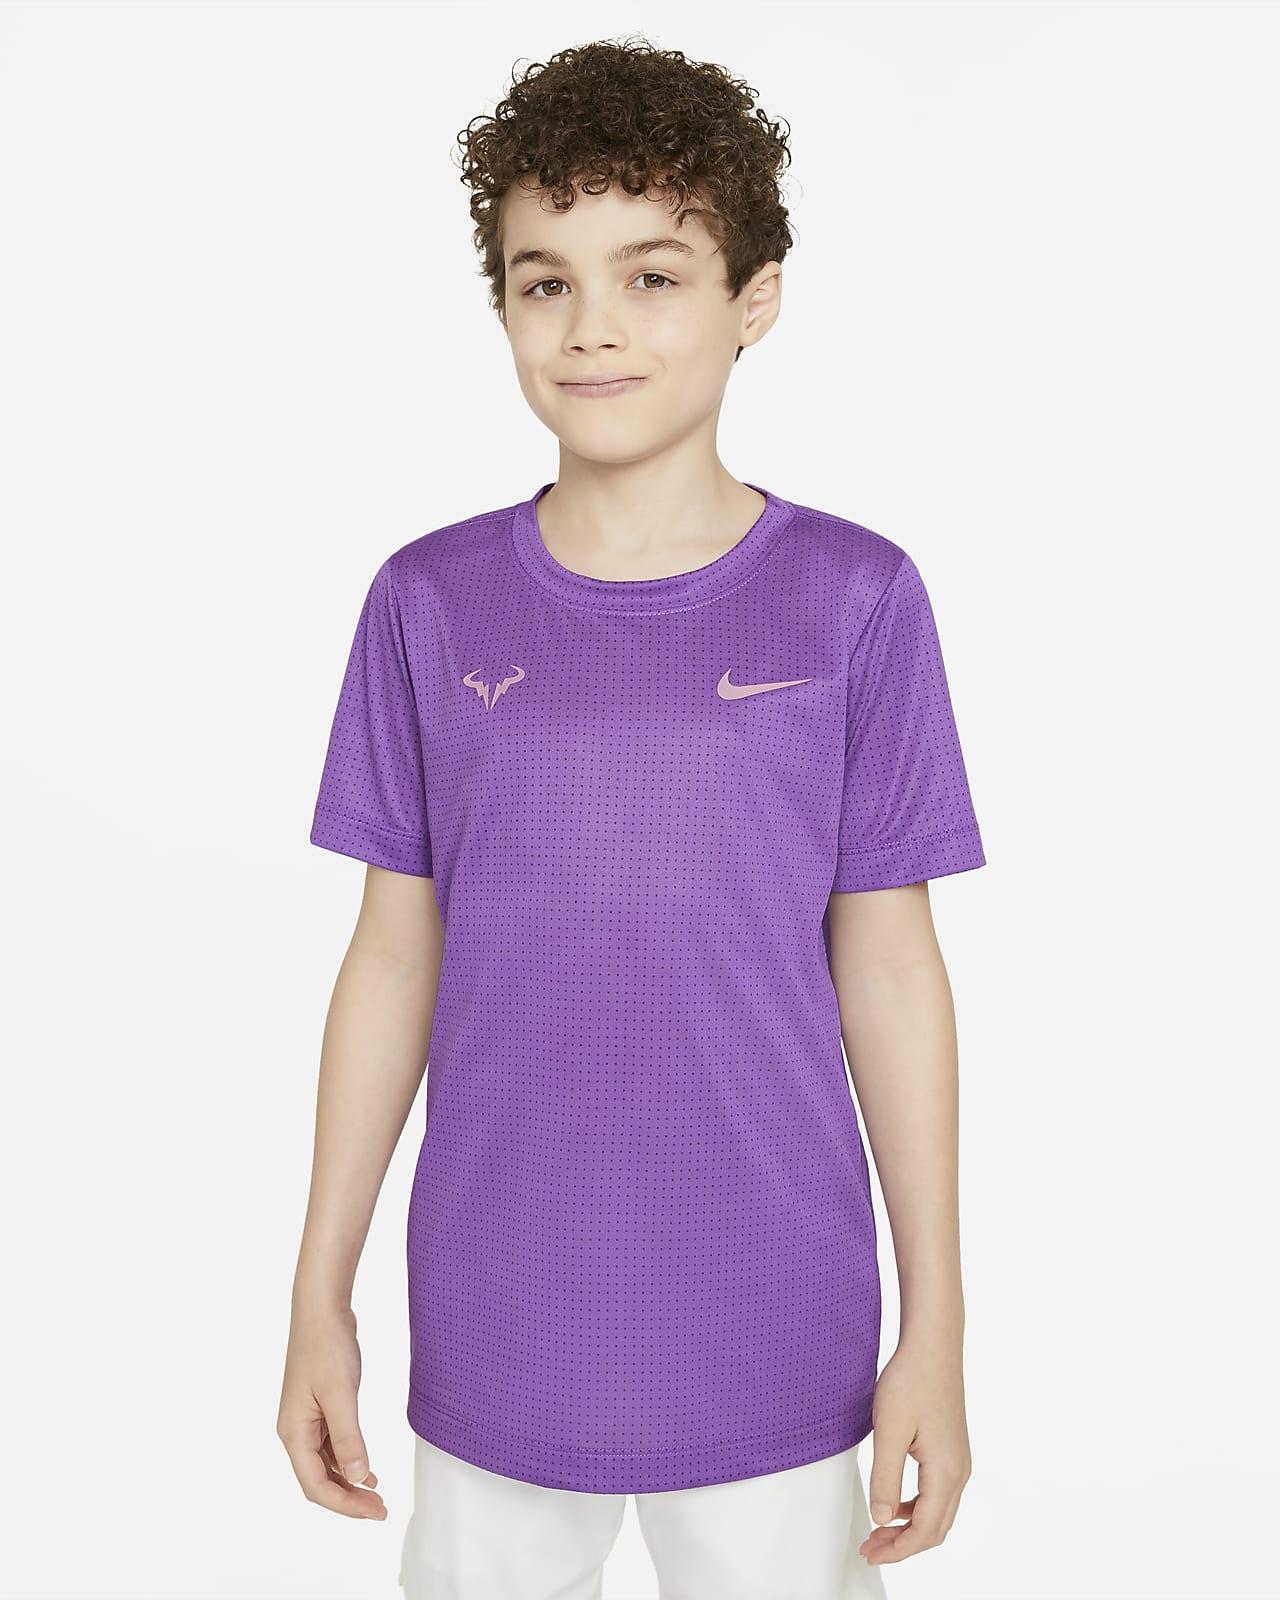 Rafa Older Kids' (Boys') Tennis T-Shirt